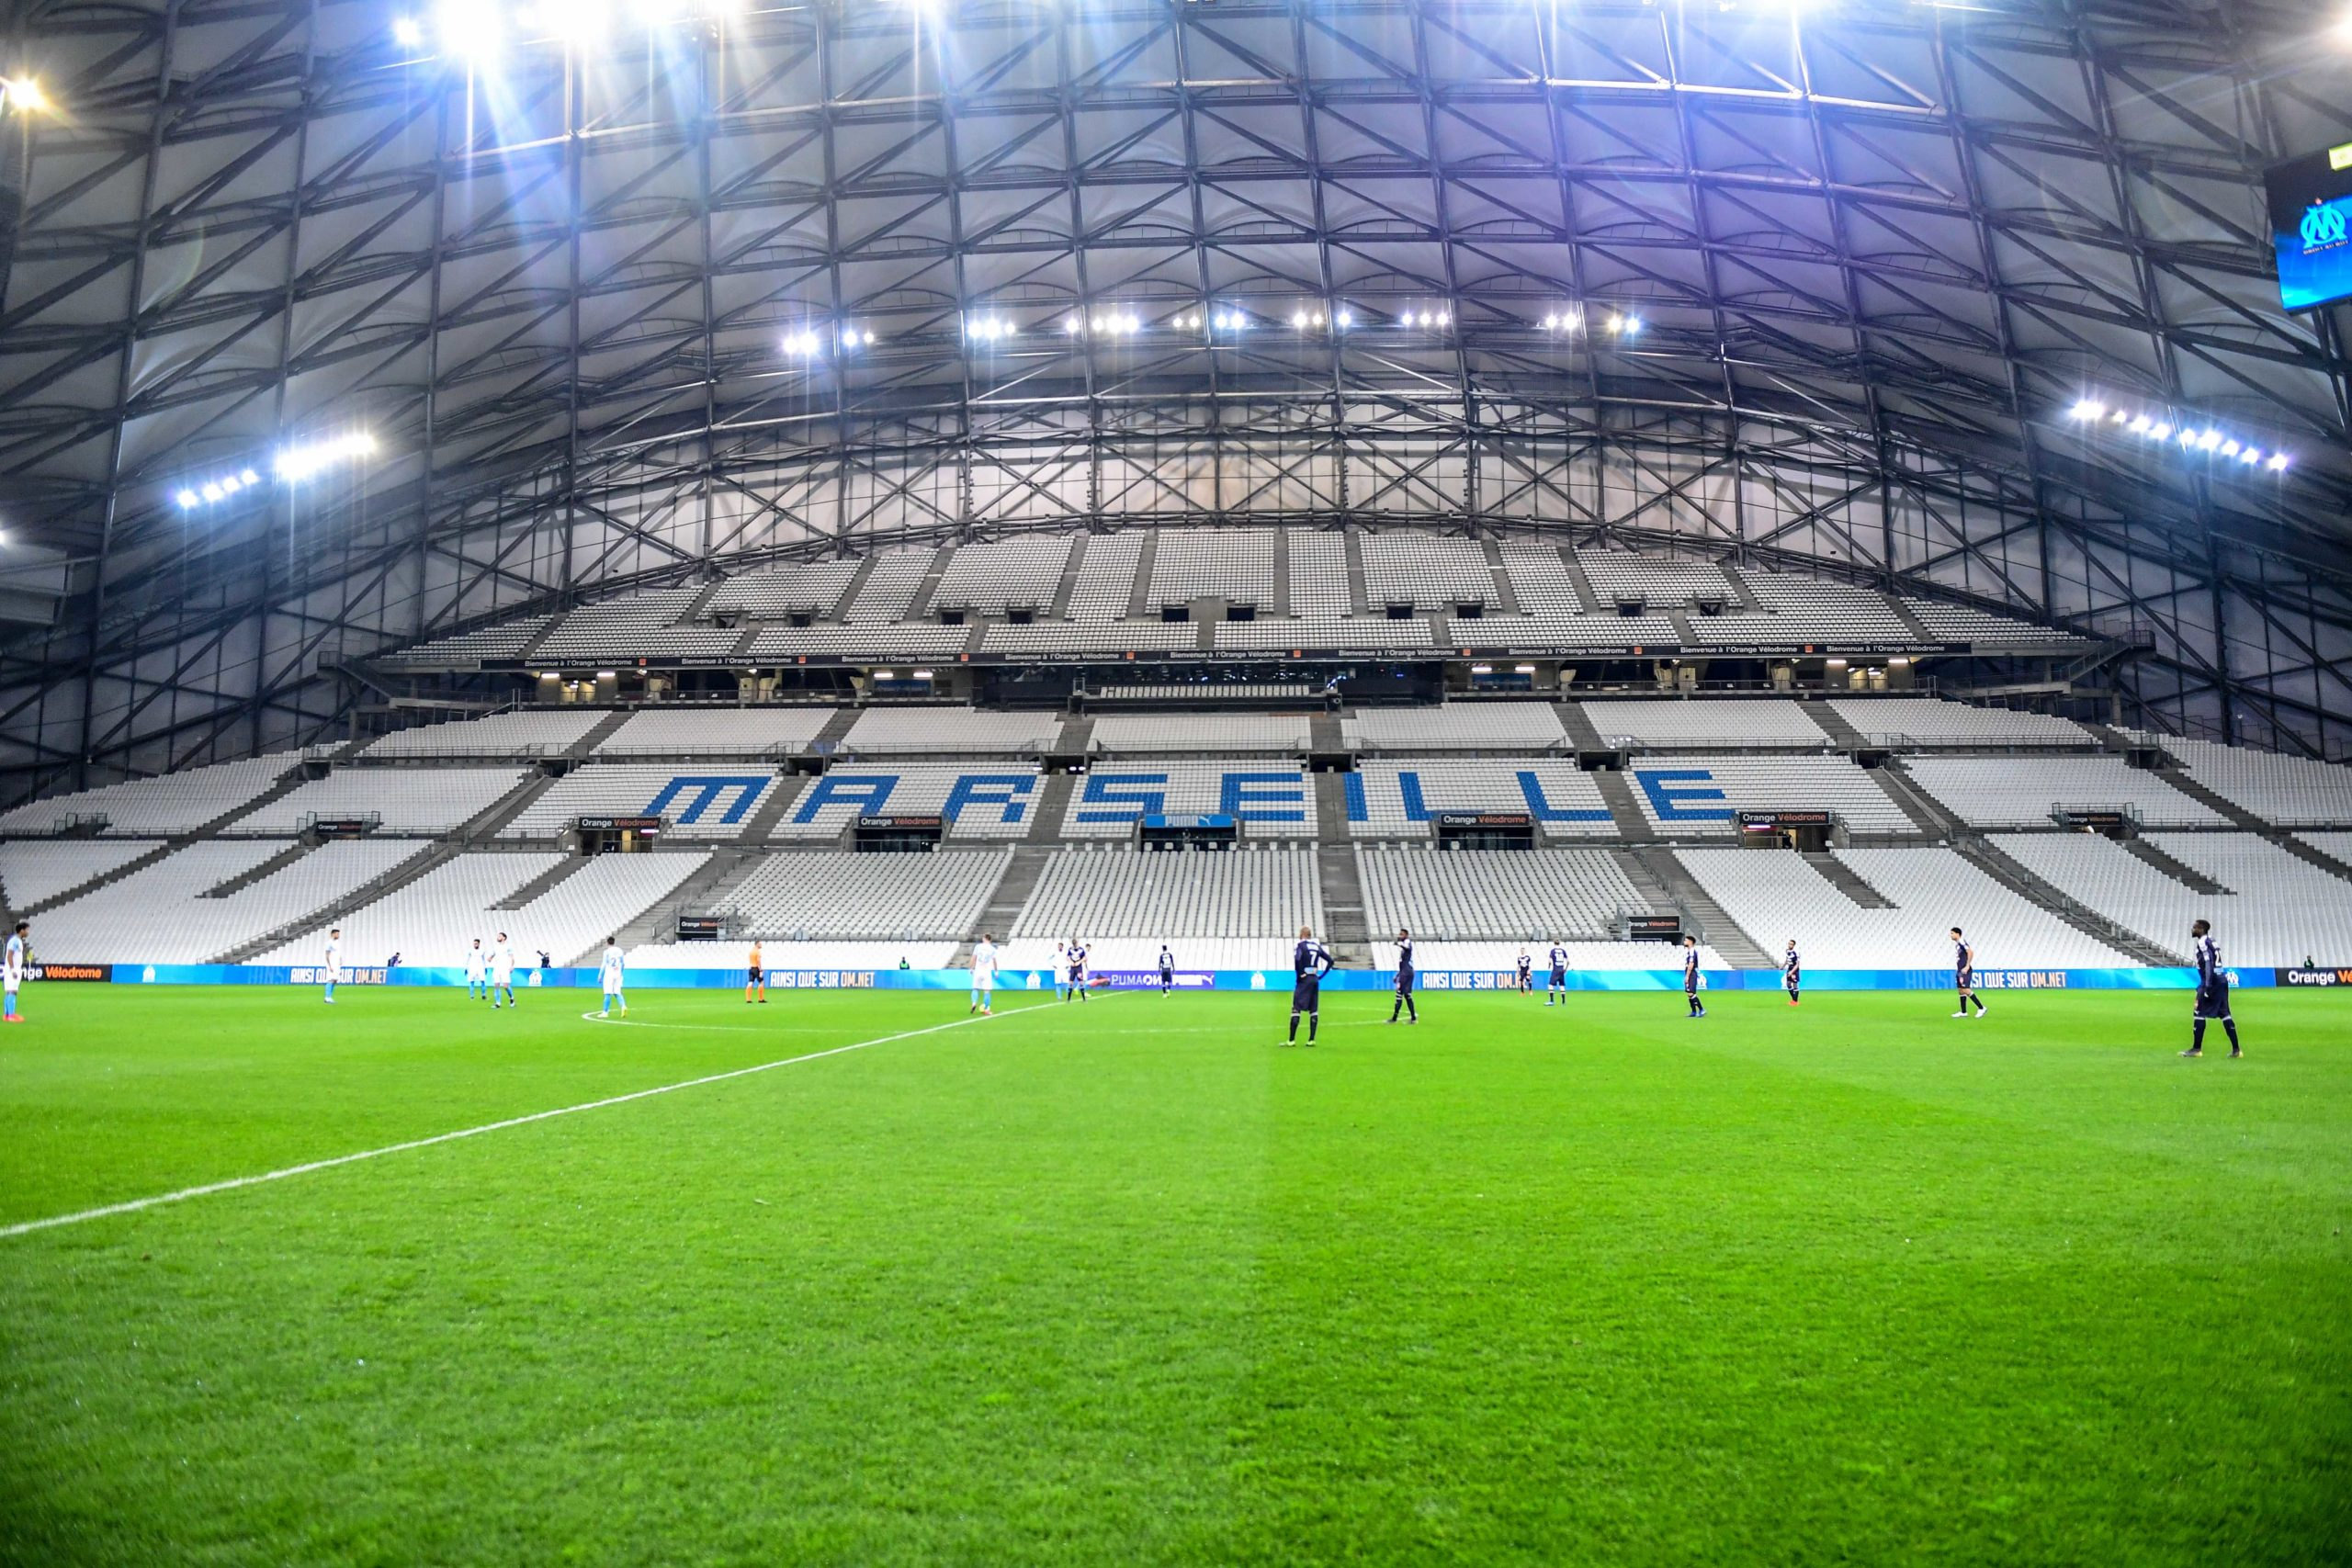 OM - Marseille a souffert de l'absence de ses supporters